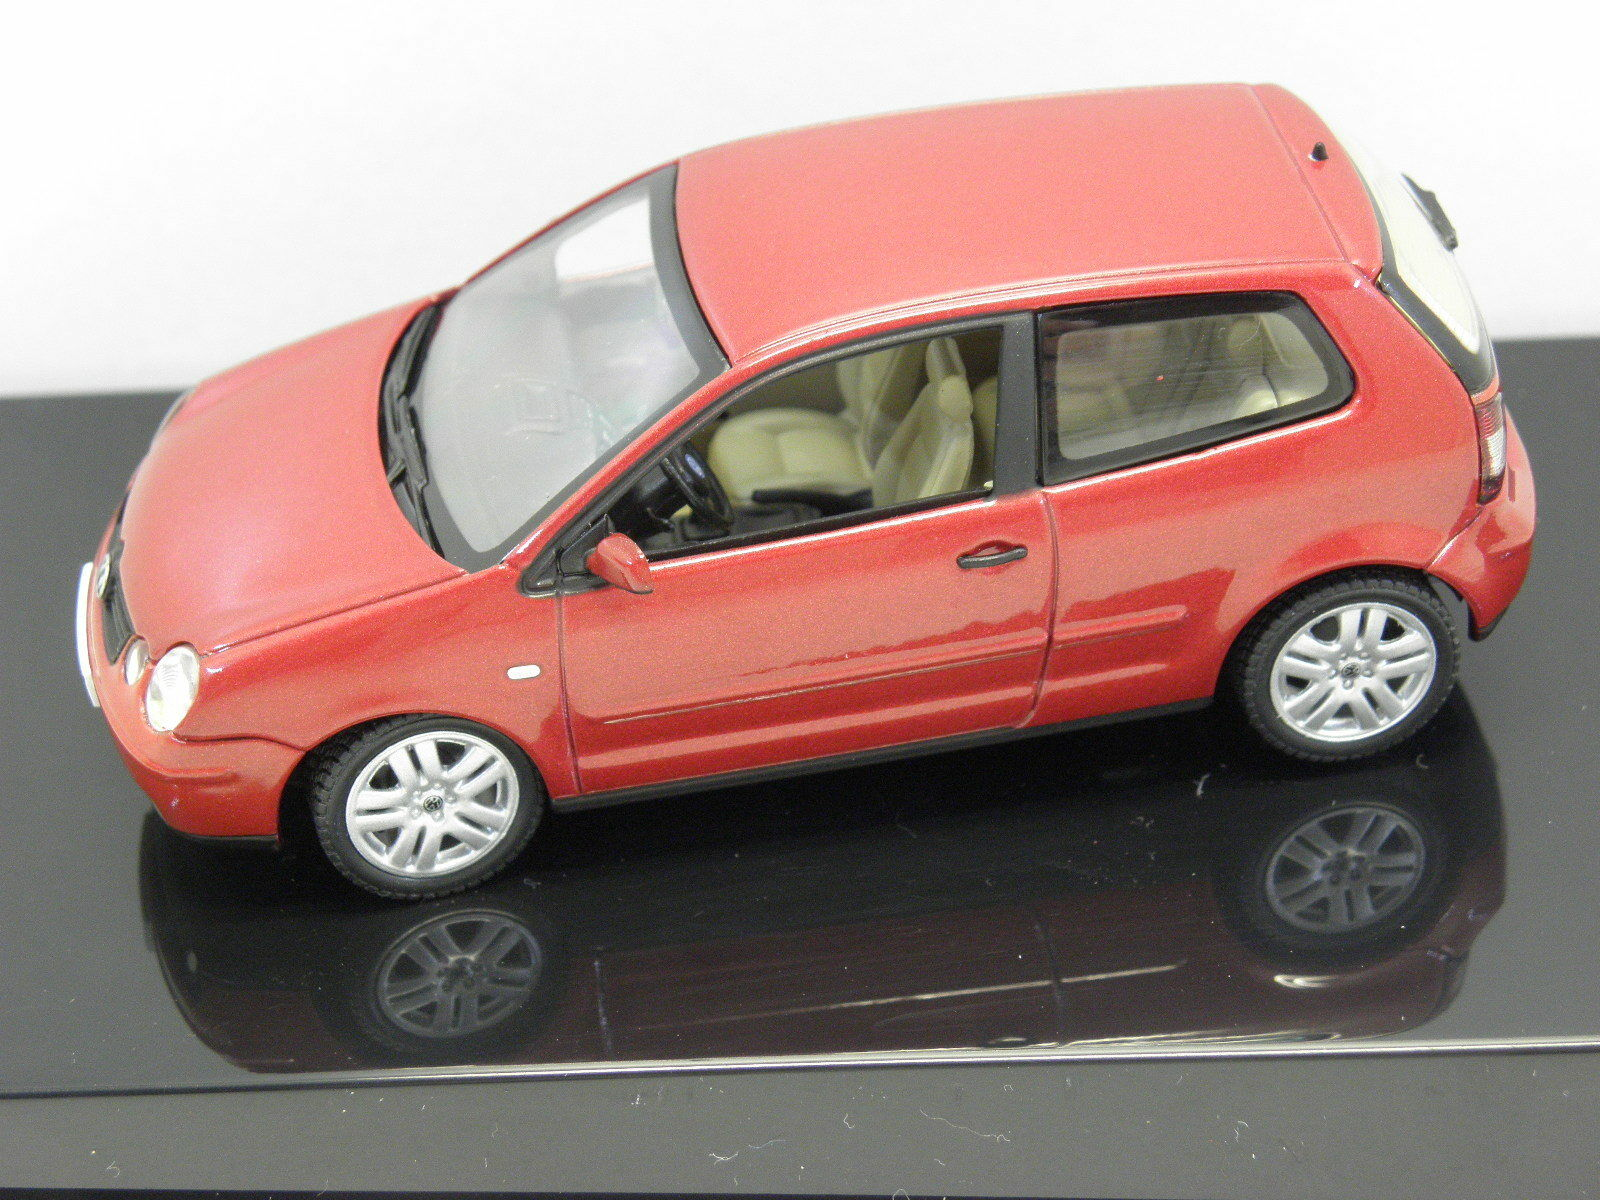 AUTOART 59767 Stand Modèle VW Polo 2001 (Muranoruge Perleffekt) échelle 1 43